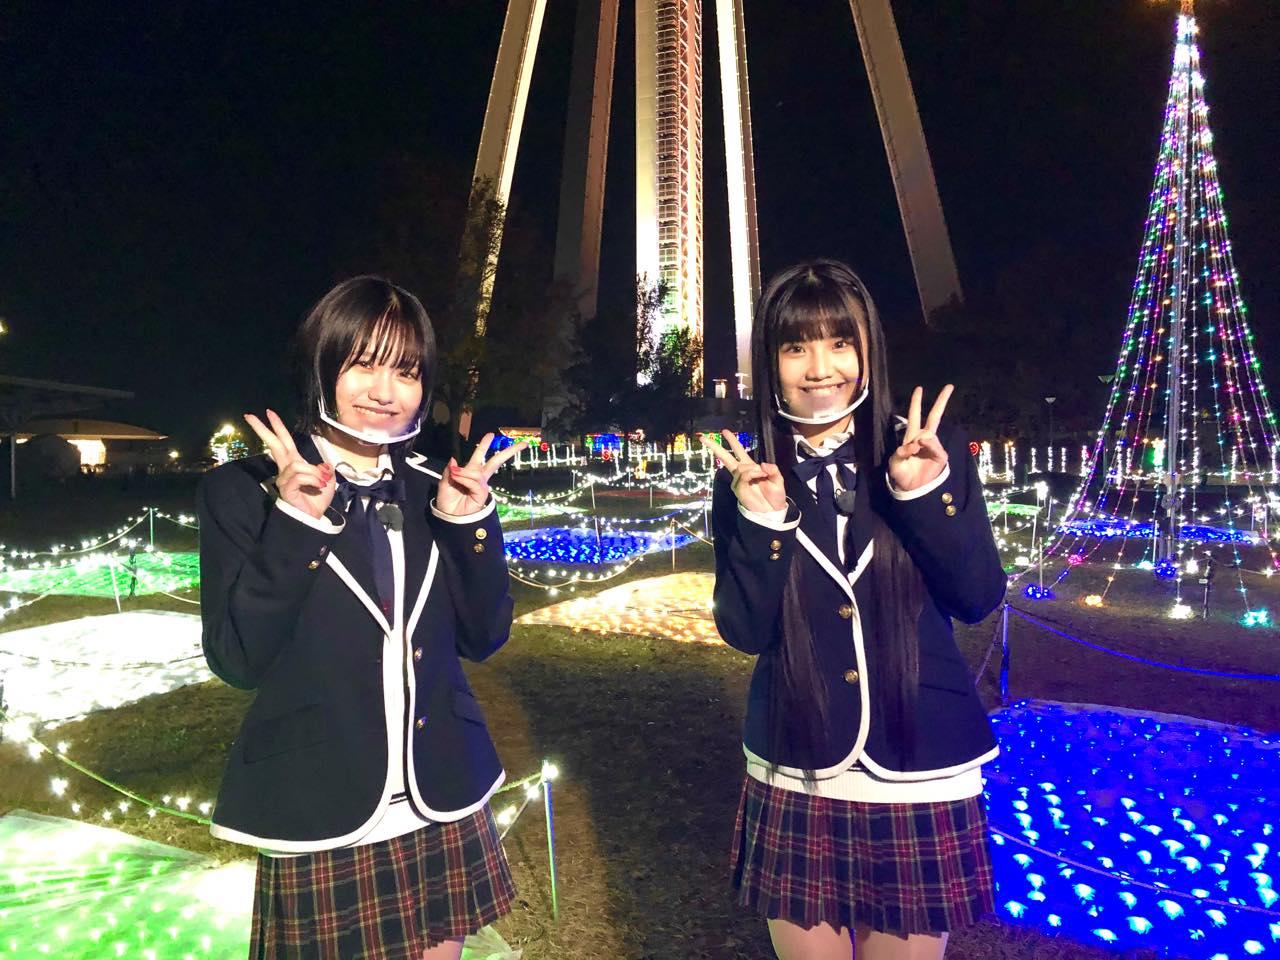 「SKE48は君と歌いたい」北川愛乃&佐藤佳穂が138タワーパークを訪れる②【東海テレビ】